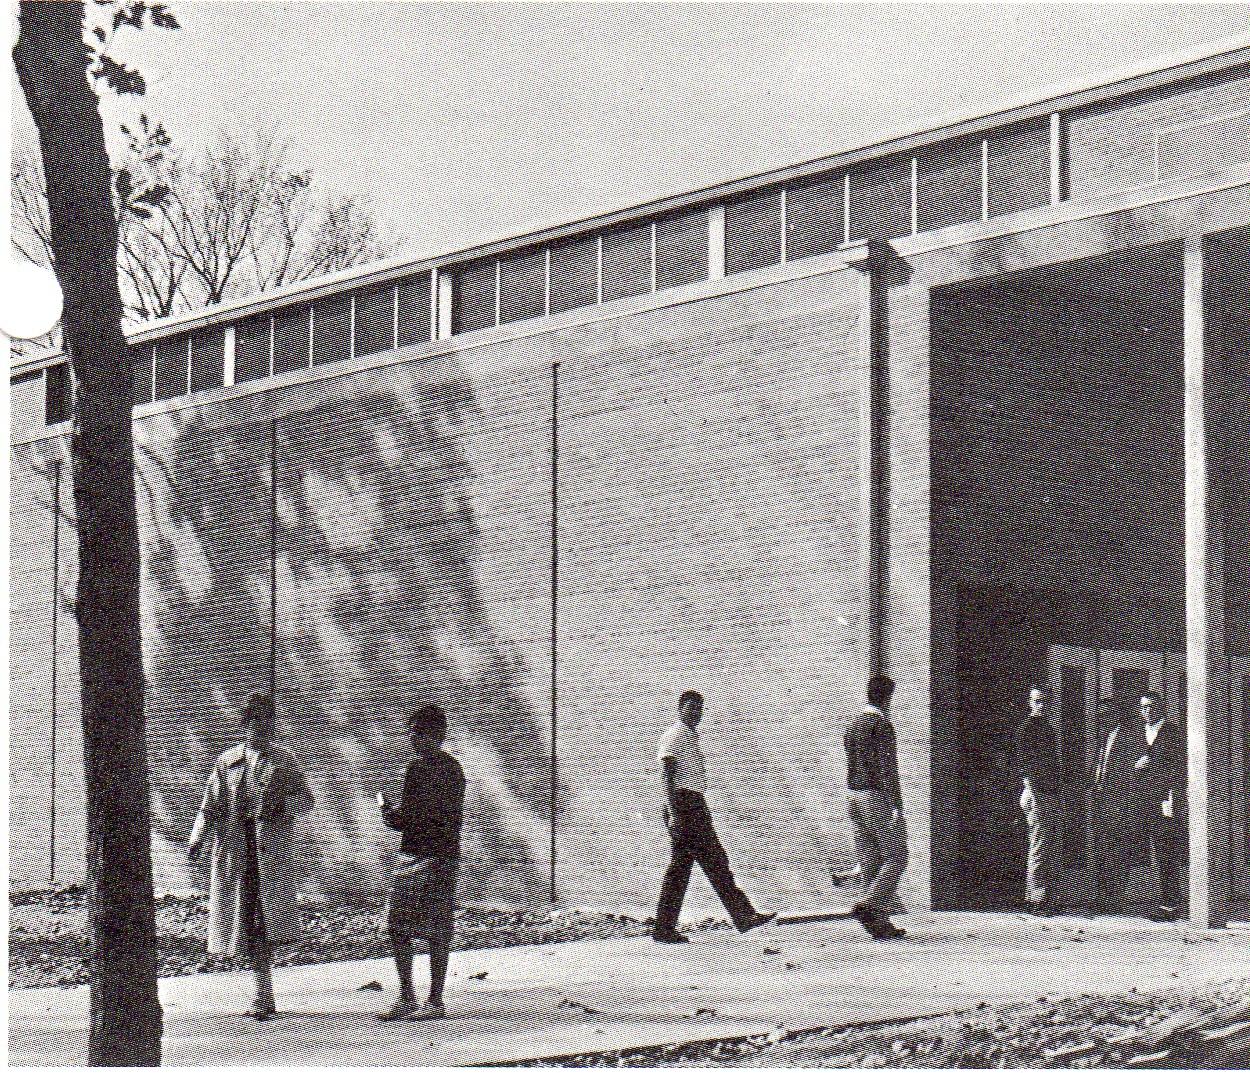 Dunn Athletic Center